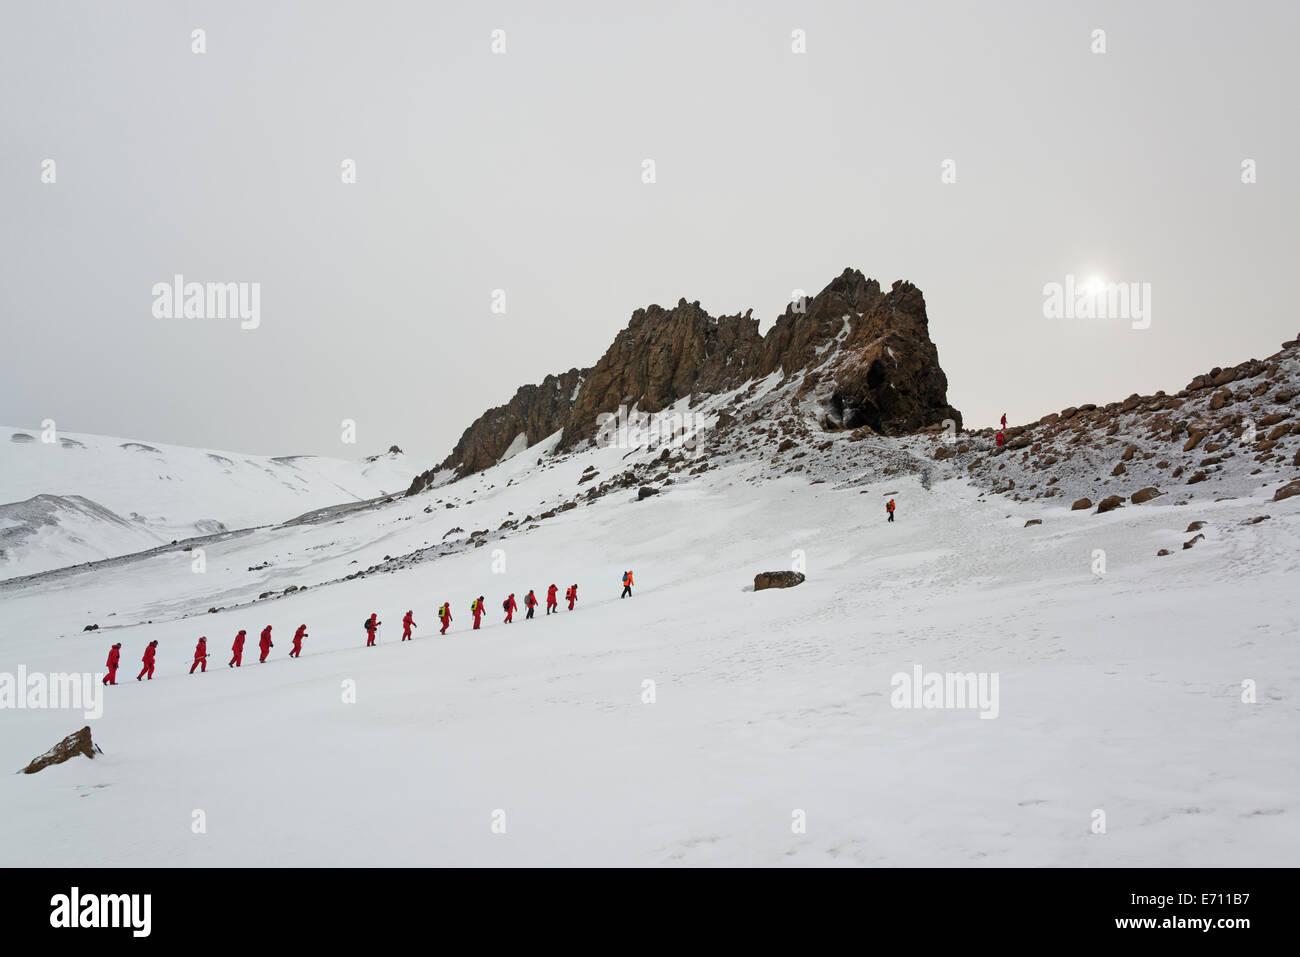 Travellers in bright orange waterproofs walking in a line across the snow on Deception island. - Stock Image